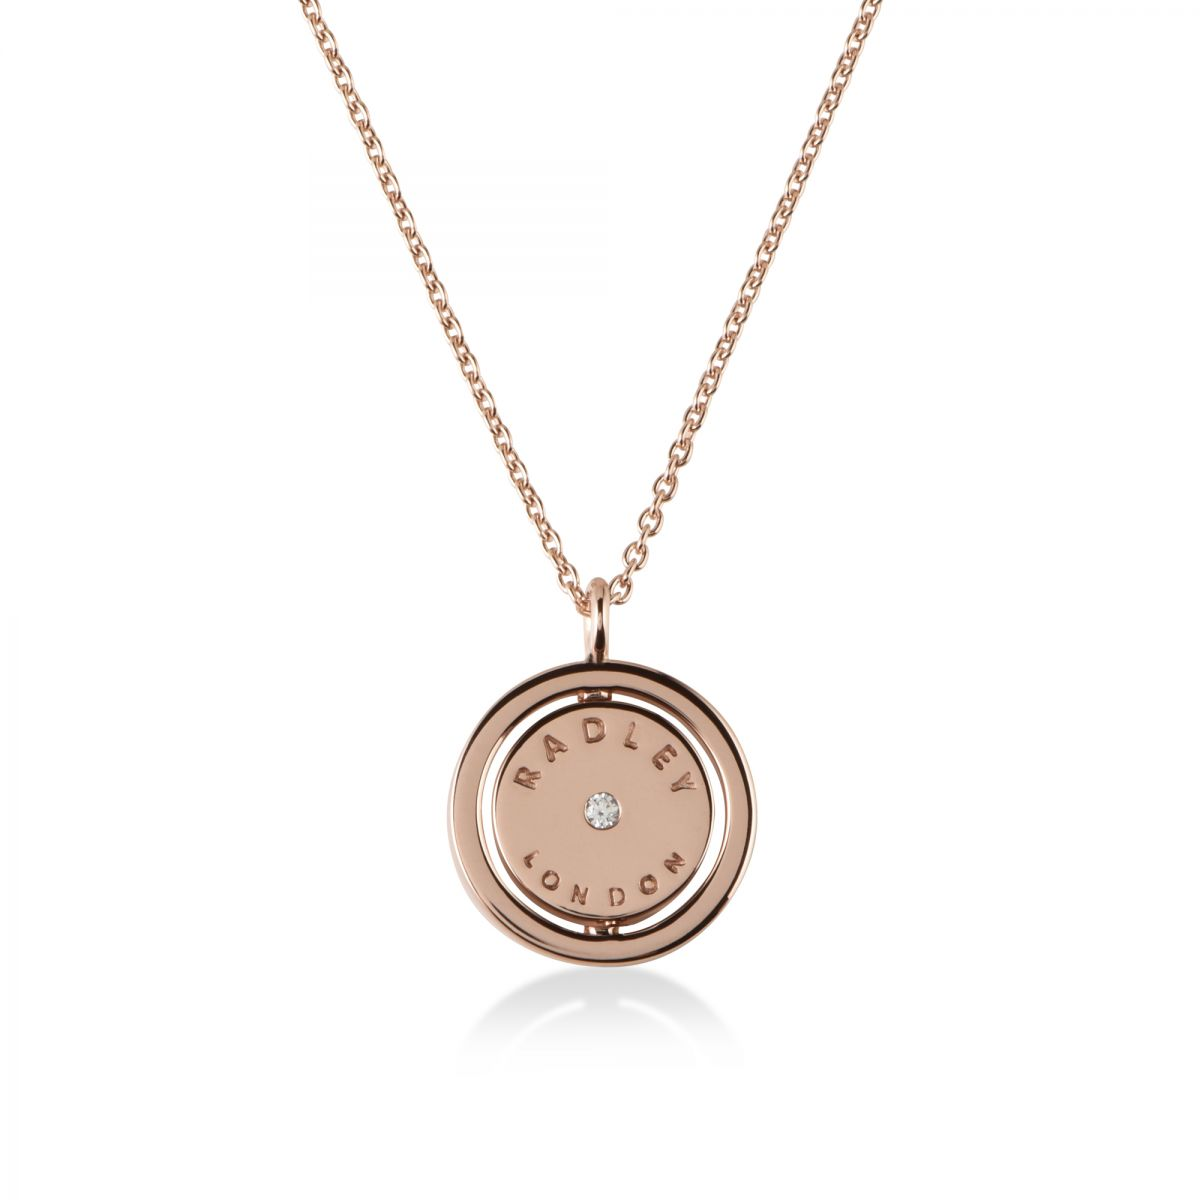 Radley Love Silver Necklace RYJ2015 ssTr2OE4NA